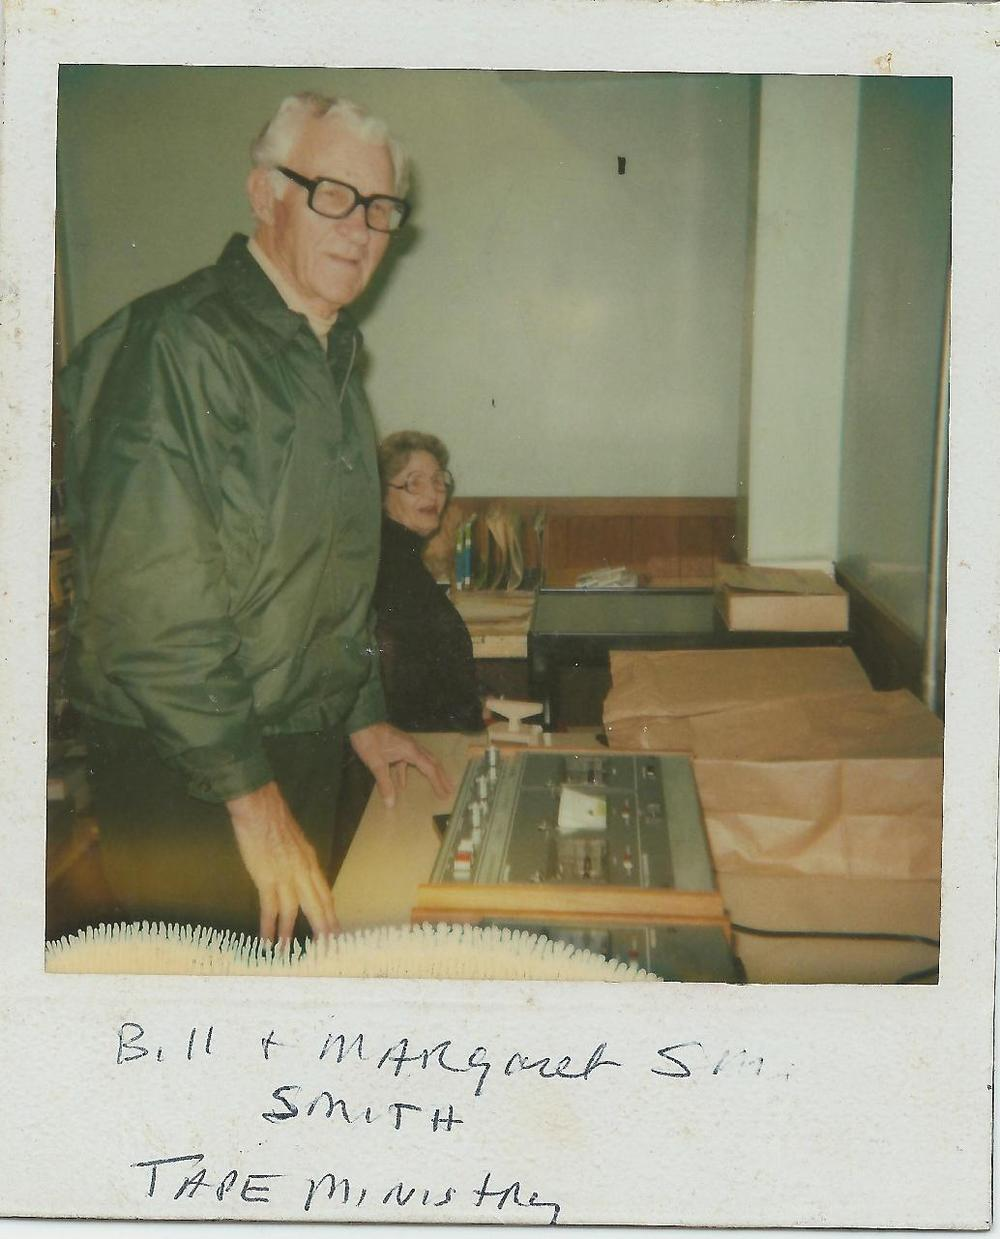 PMBC+Tape+Ministry+Bill+&+Margaret+Smith,+c.+early+80's.jpg